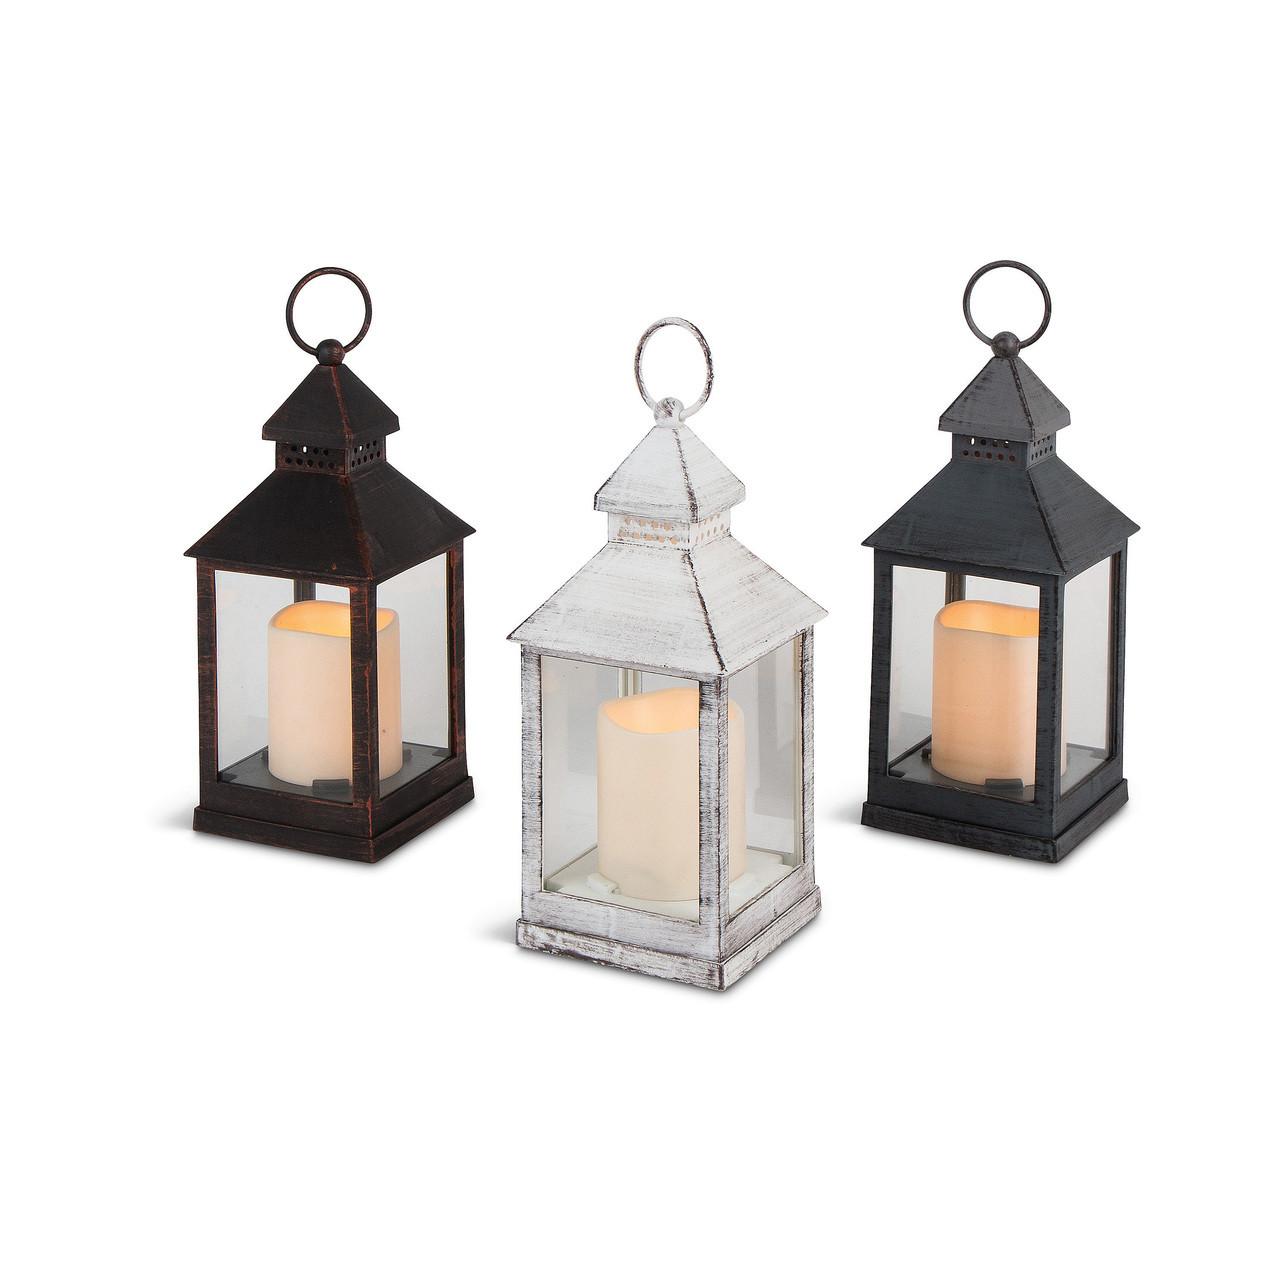 Pp09 Solar Coach Lantern Pillar Column Pedestal: Plastic Indoor/Outdoor Lantern With Glass Panes And Timer